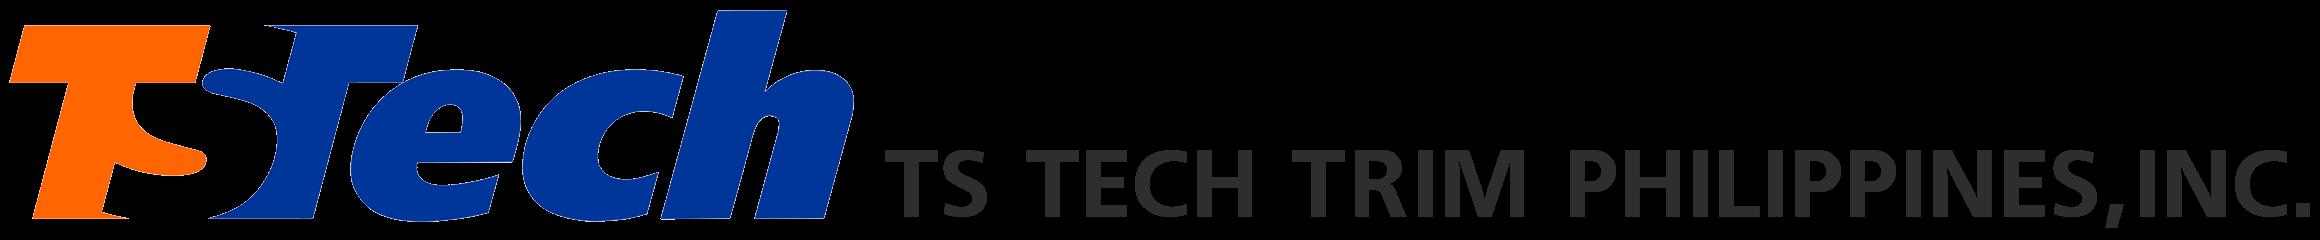 TS Tech Trim Philippines Inc.